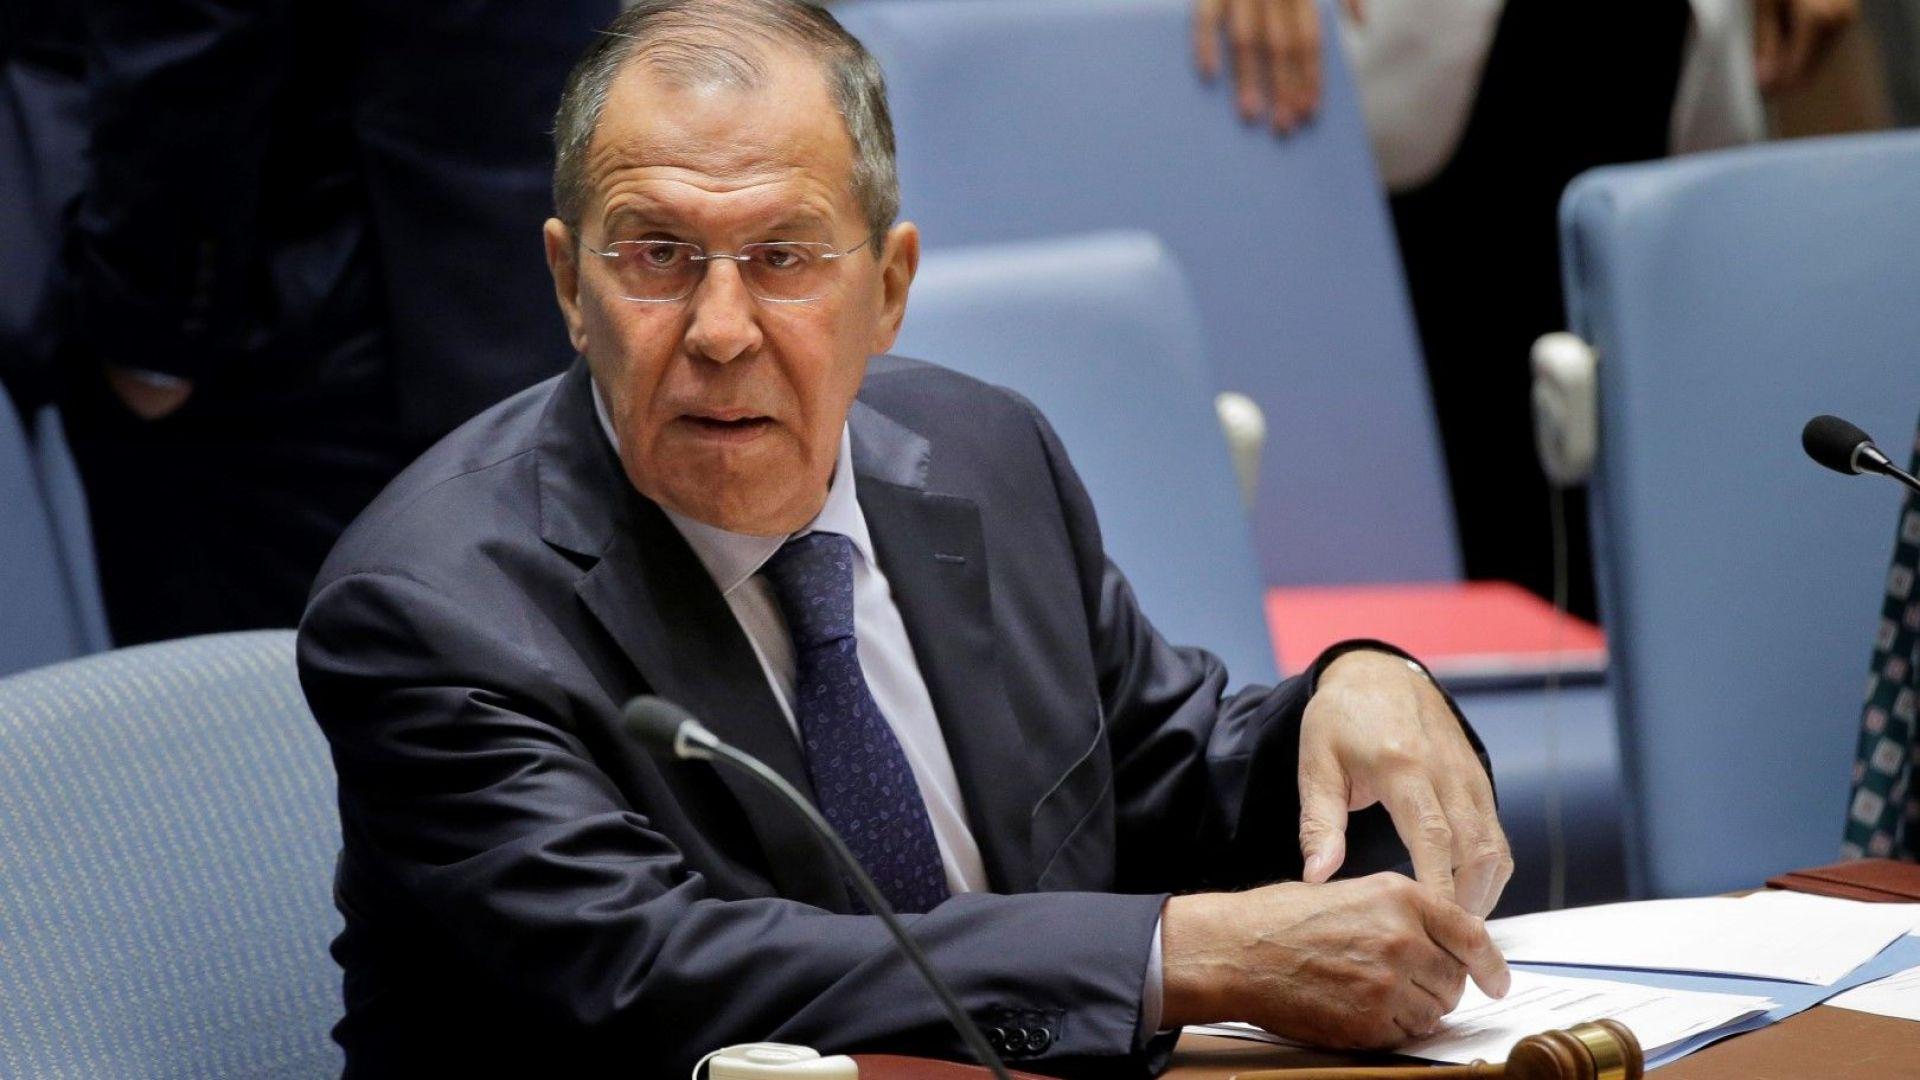 Лавров заяви, че Русия готви сюрприз за САЩ заради визовия скандал